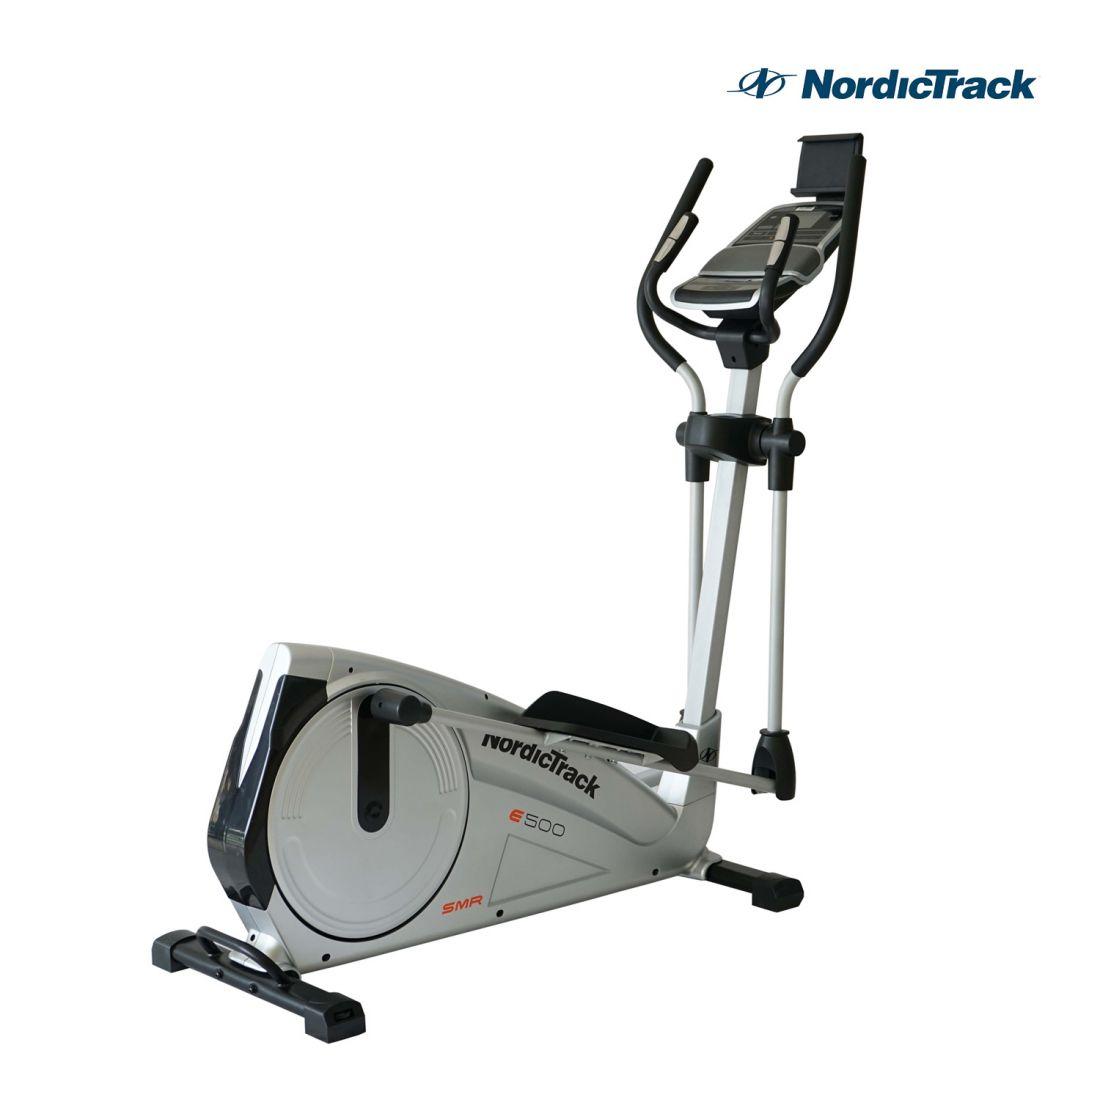 Эллиптический тренажер - NordicTrack E500